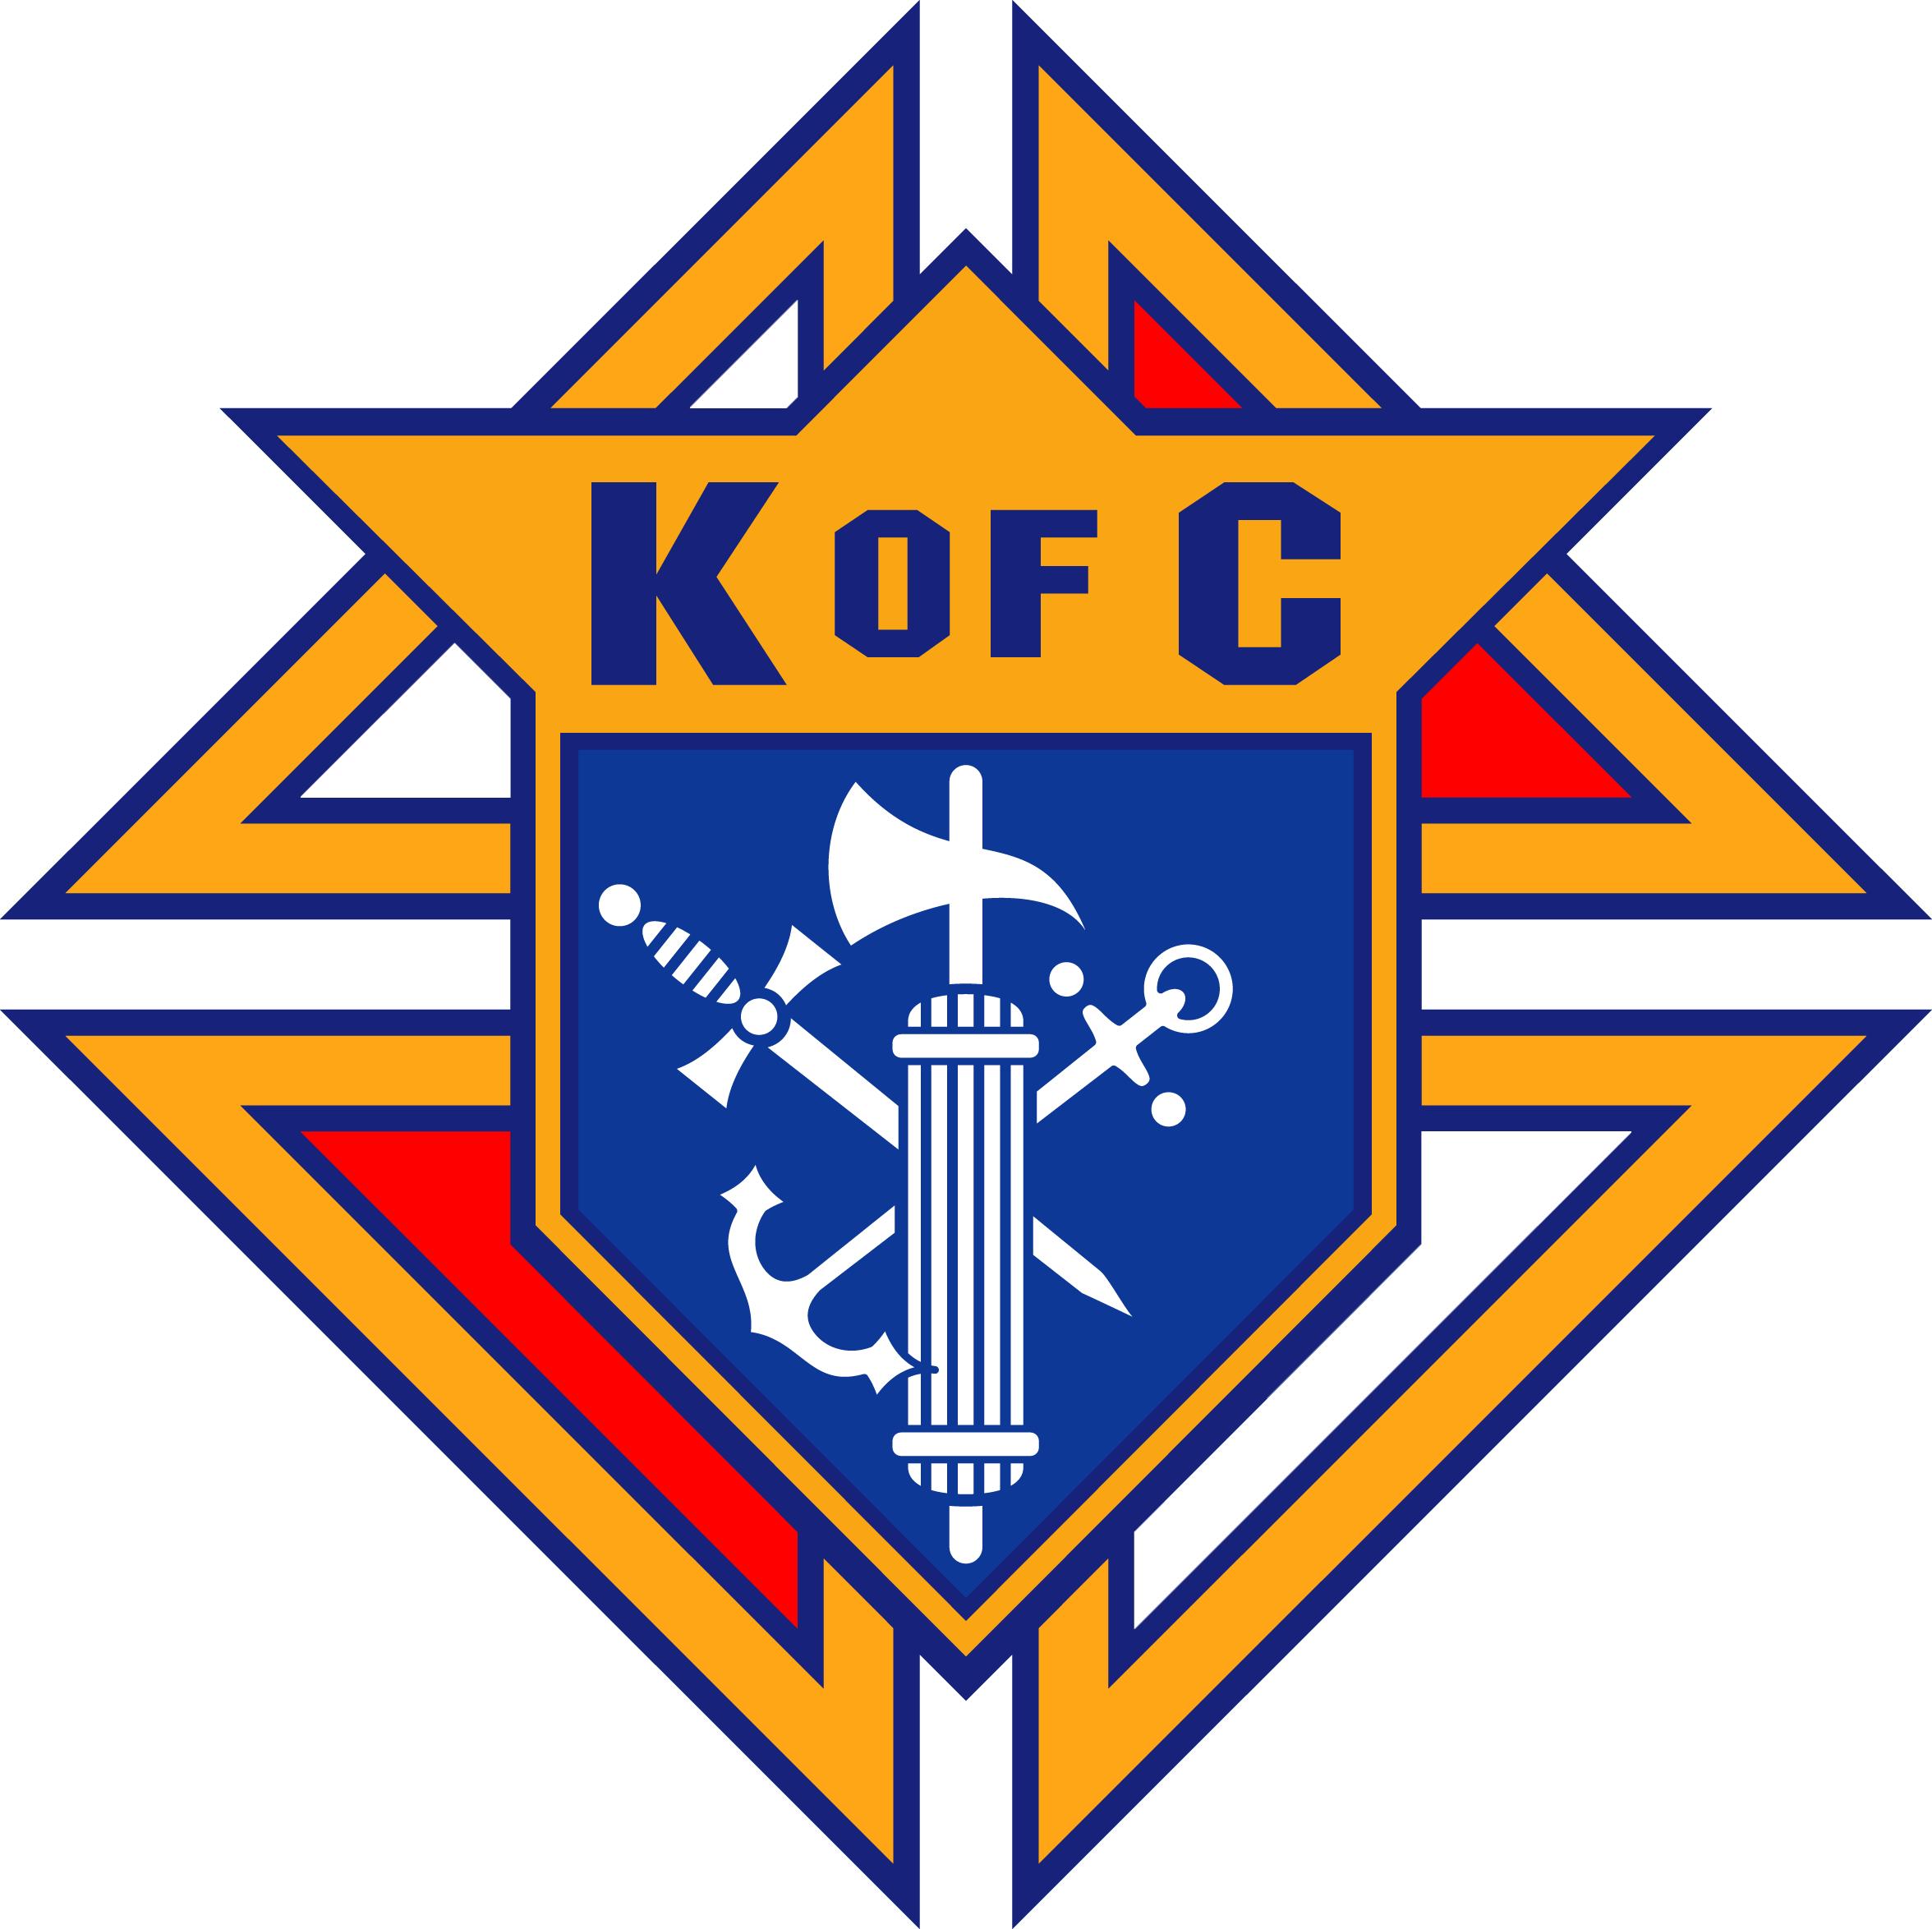 Knights of columbus Logos